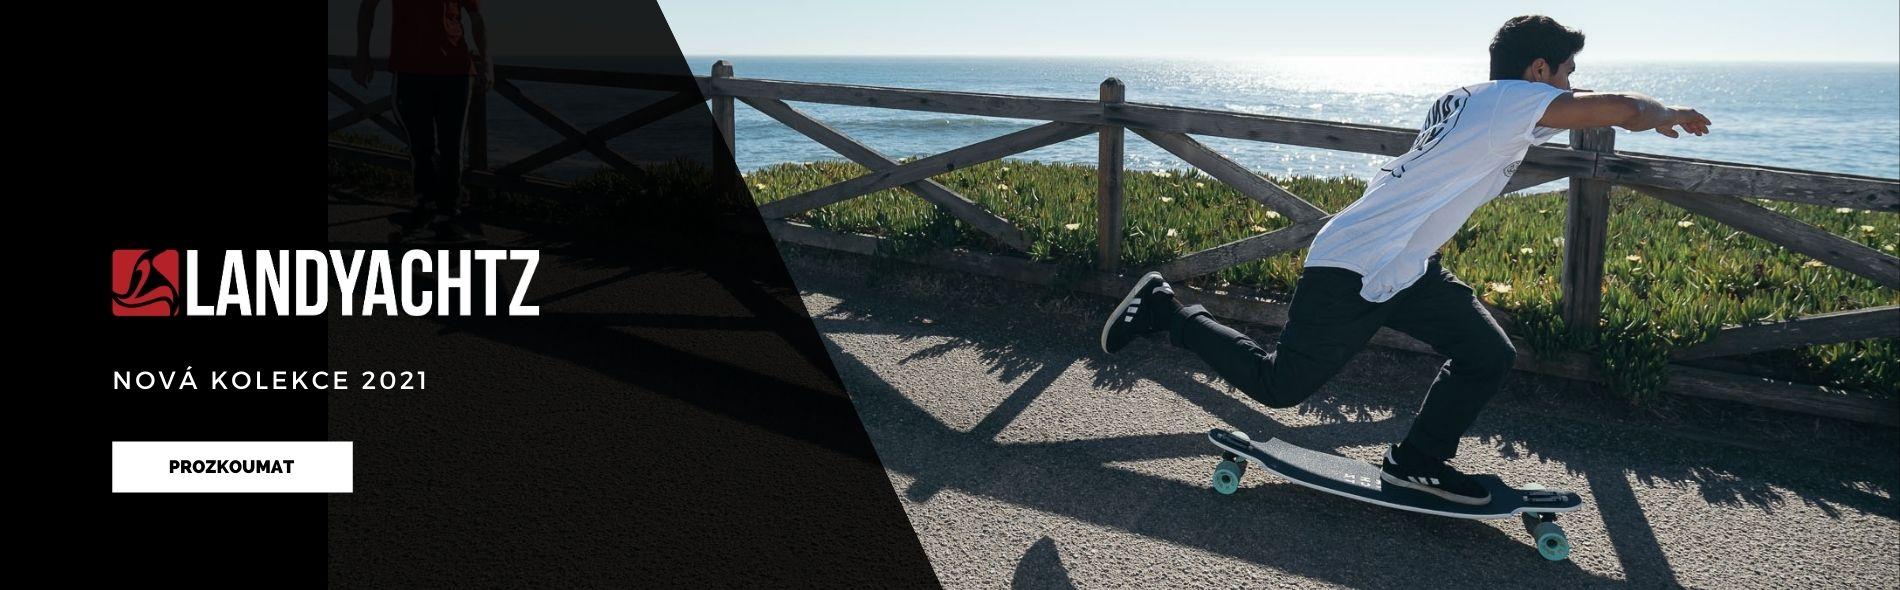 Landyachtz 2021 skladem | longboard, cruiser, skate